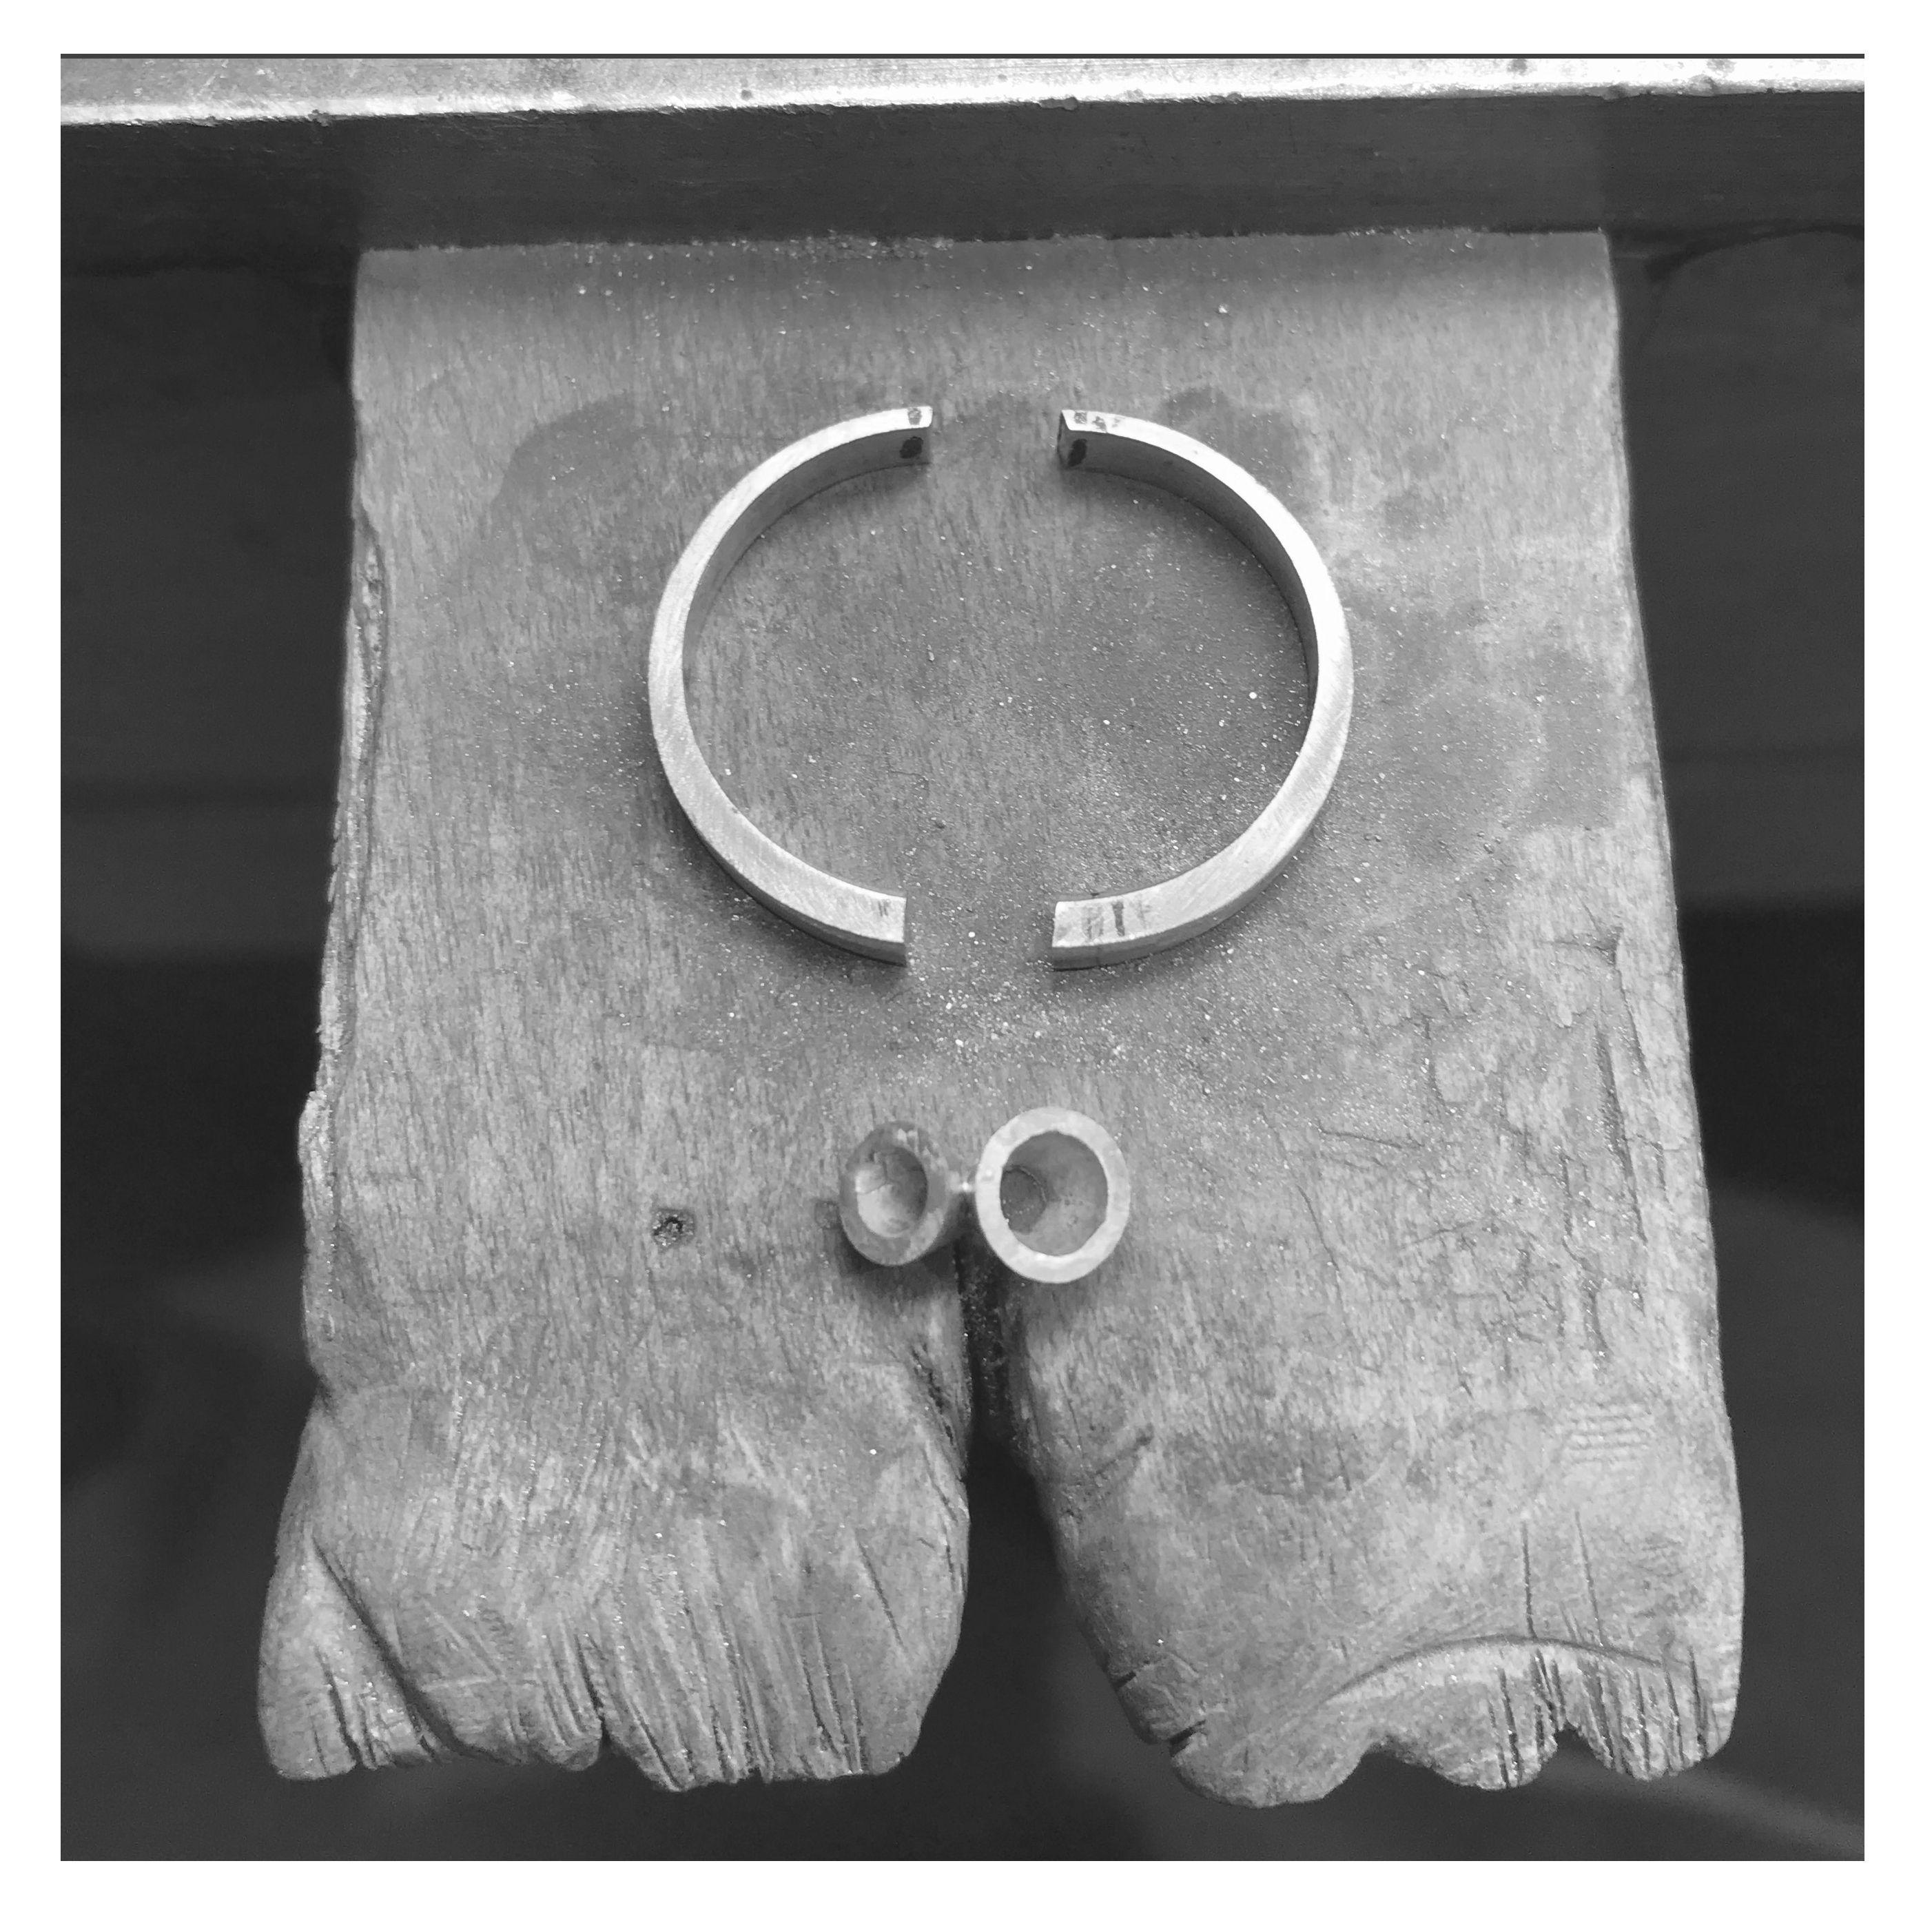 A bespoke pendant in the making 💎   #bespokejewellery #handcraftedjewellery #jewellerydesign #benchpeg #onthebench #progresspic #inthemaking #craftsmanship #handmade #designermaker #londonatelier #contemporaryjewellery #irishdesign